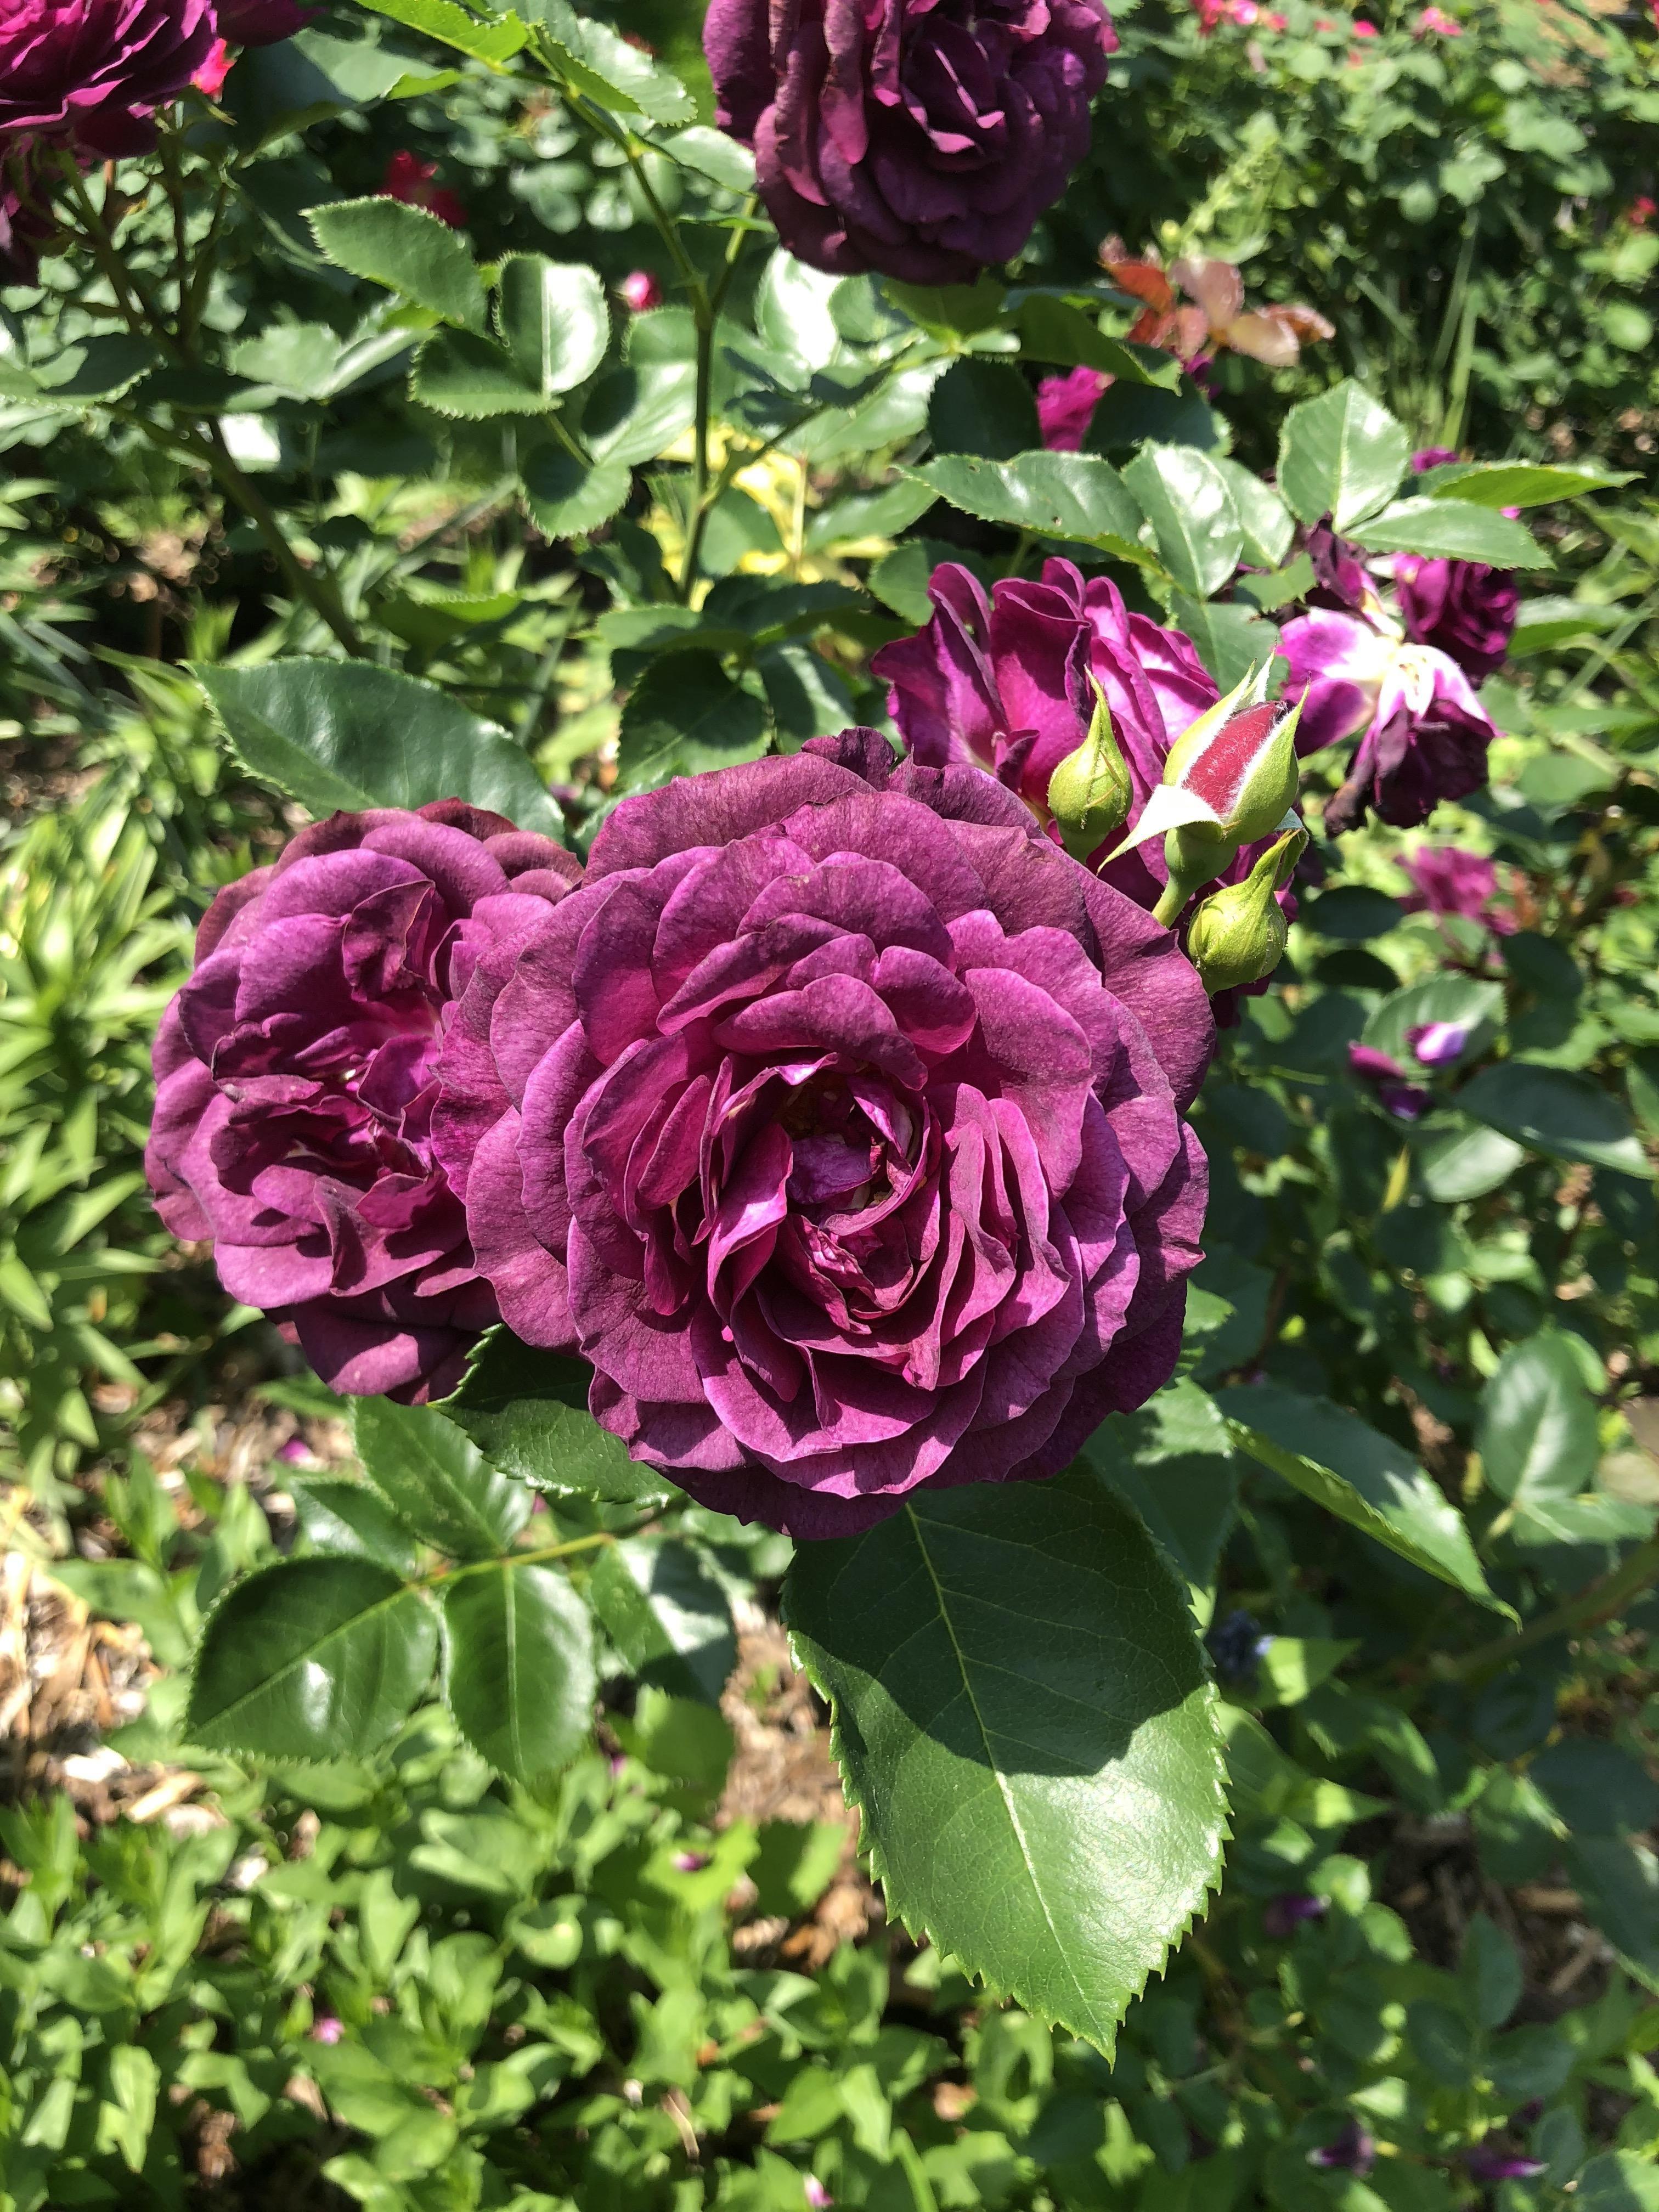 Beautiful dark purple rose gardening garden diy home